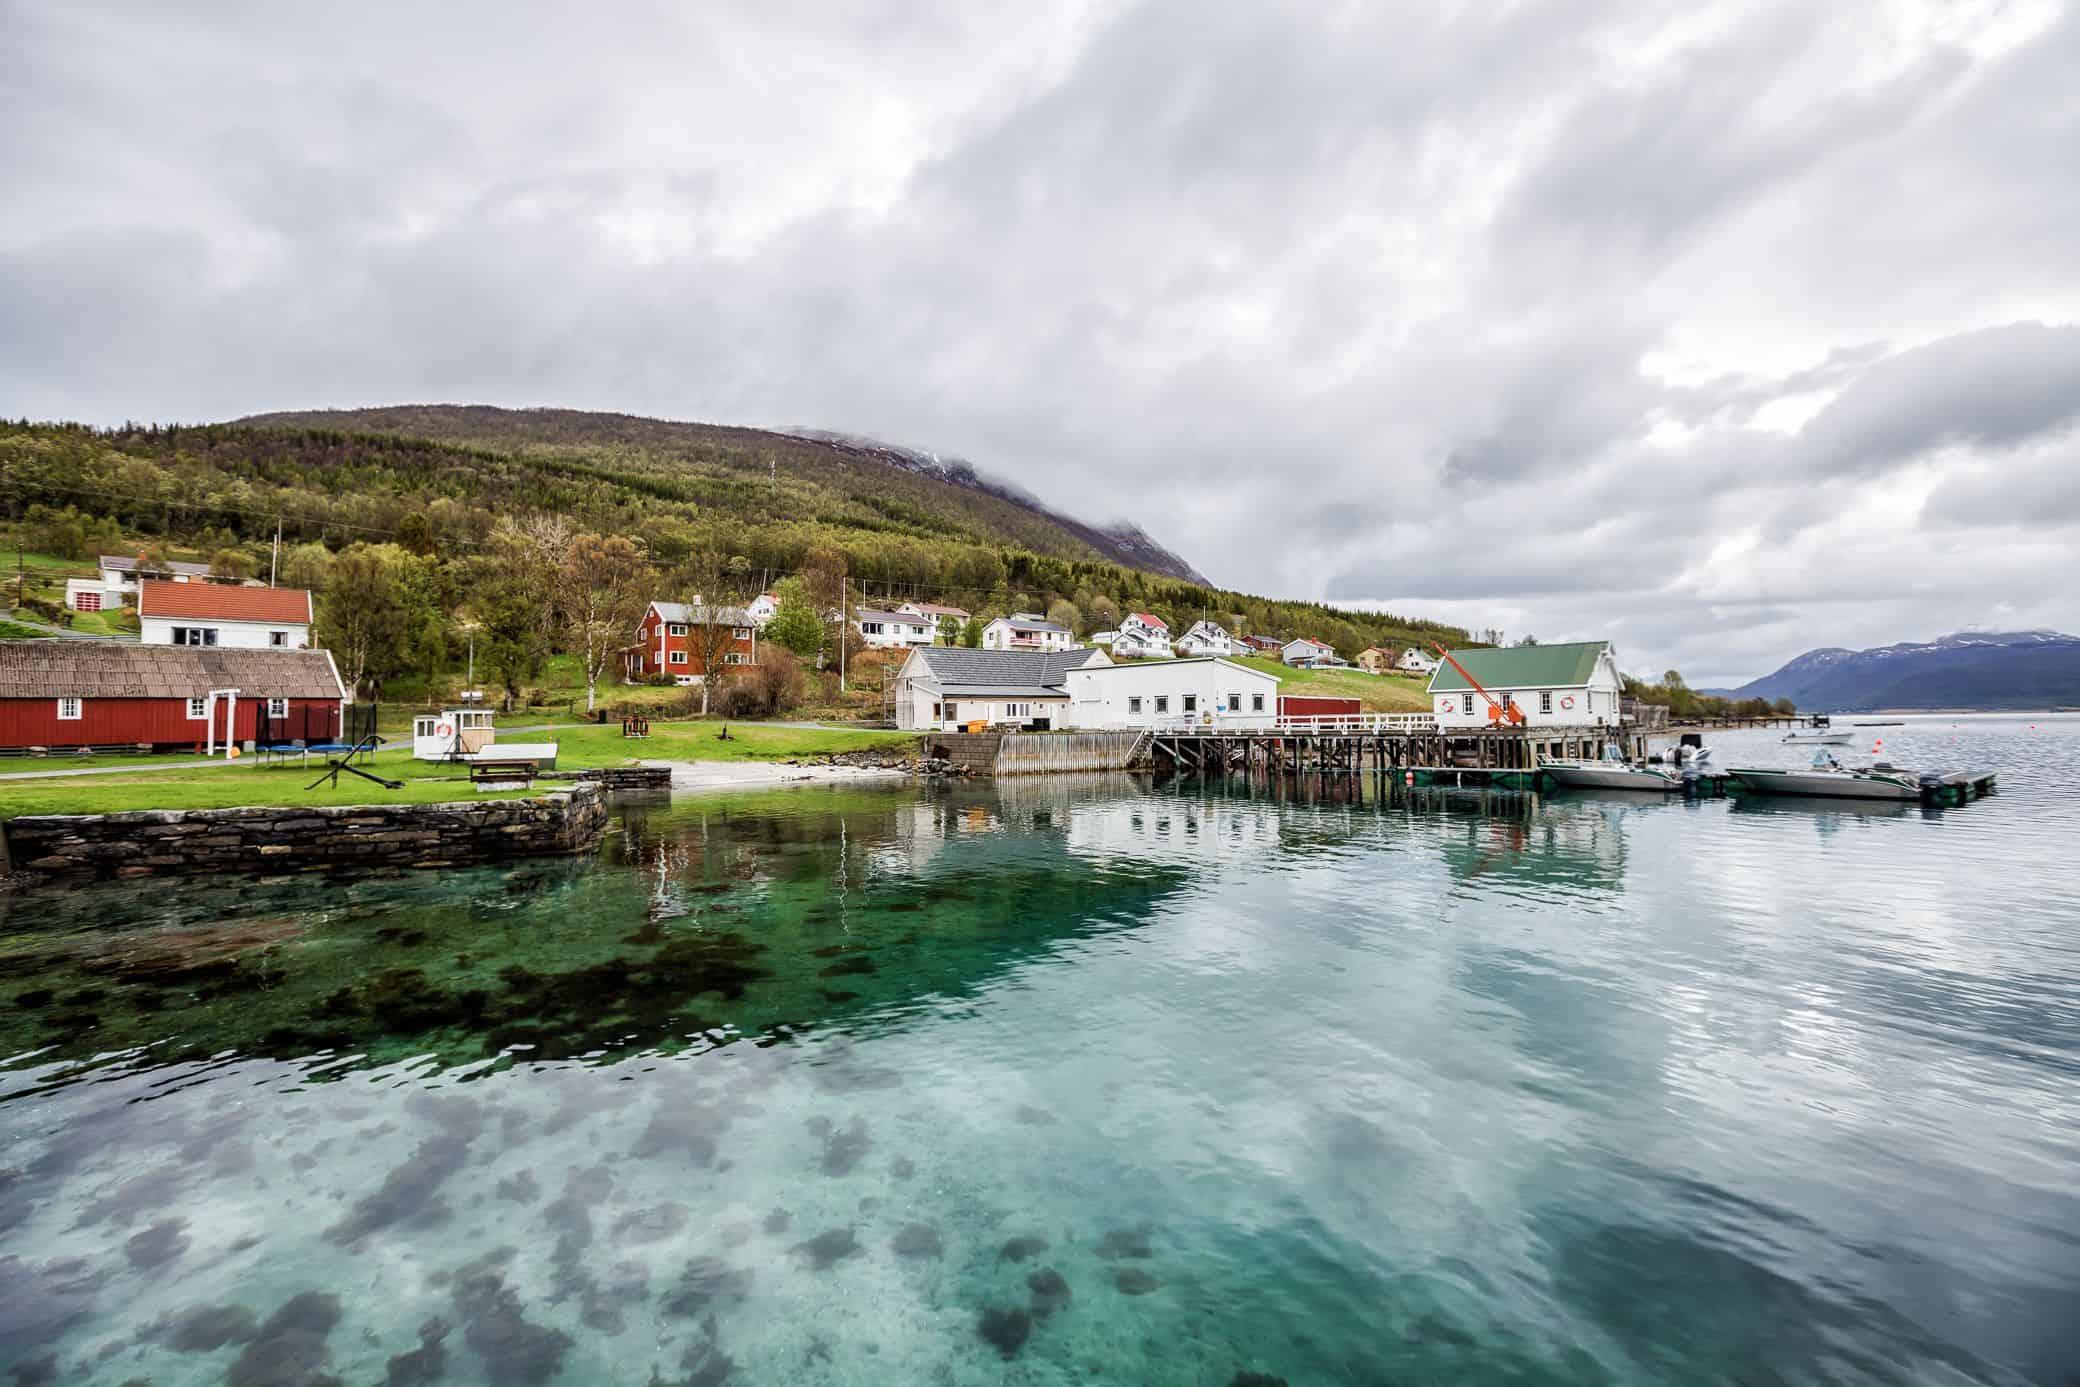 Norway pictures - Divergent Travelers